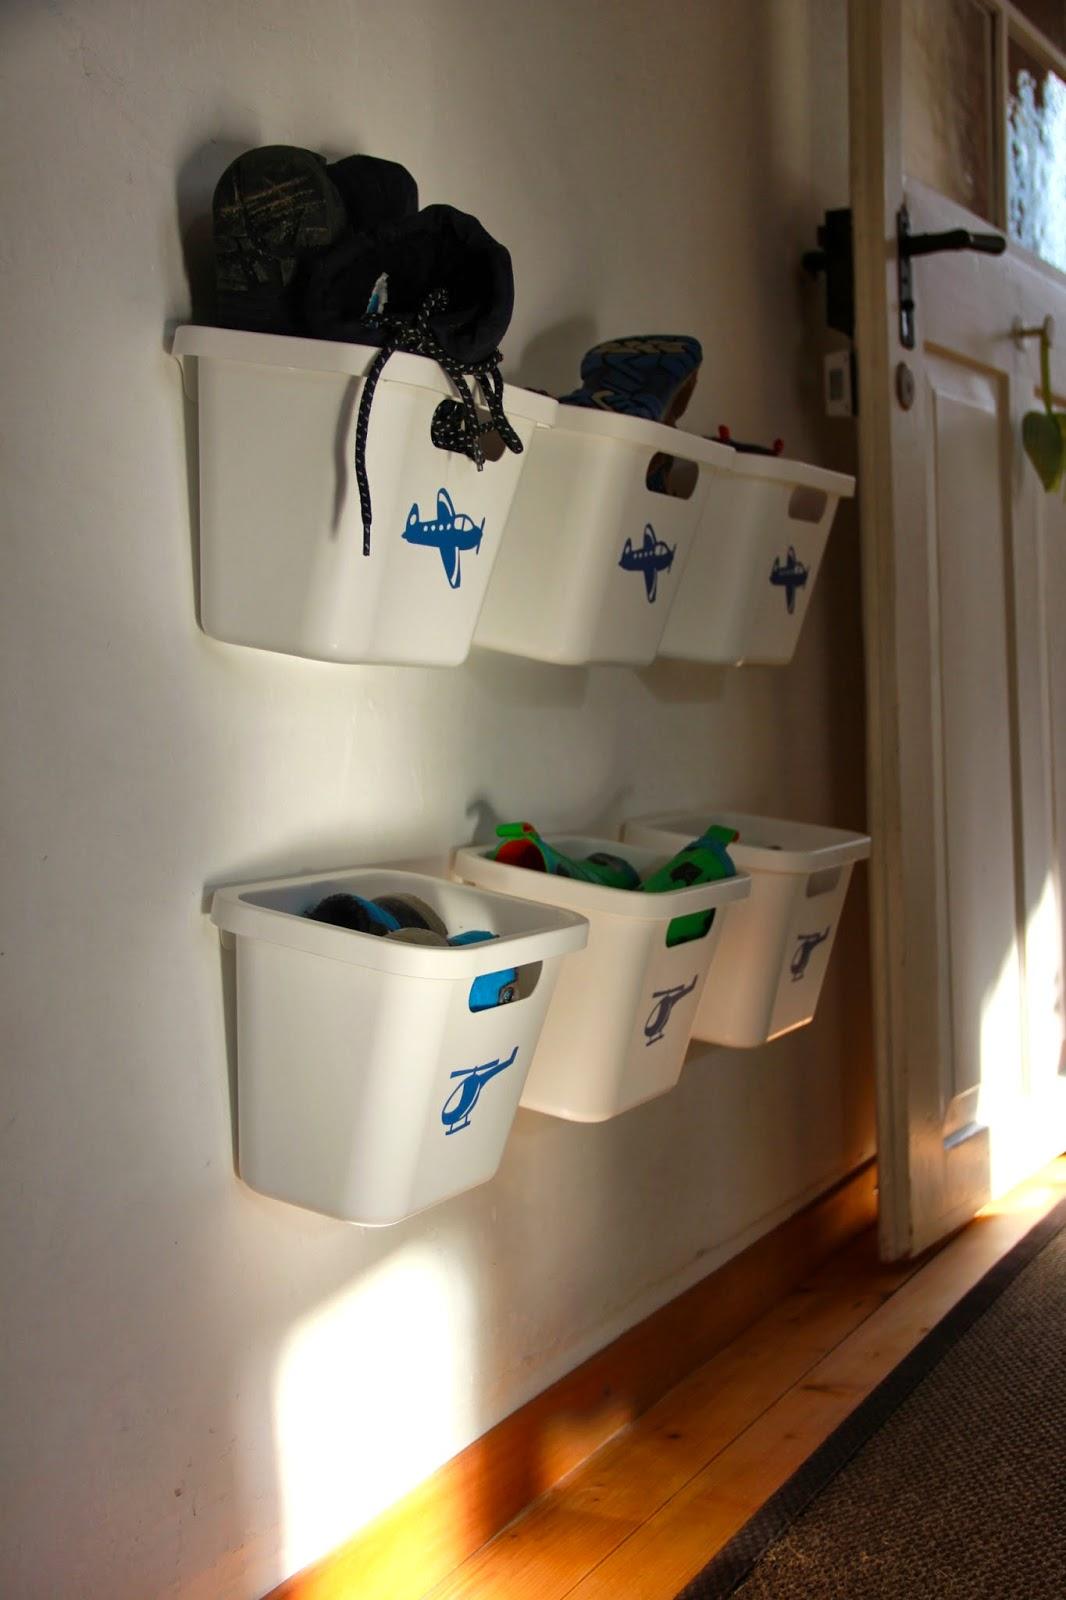 ina 39 s kreativwelt schuhregal f r kinderschuhe. Black Bedroom Furniture Sets. Home Design Ideas